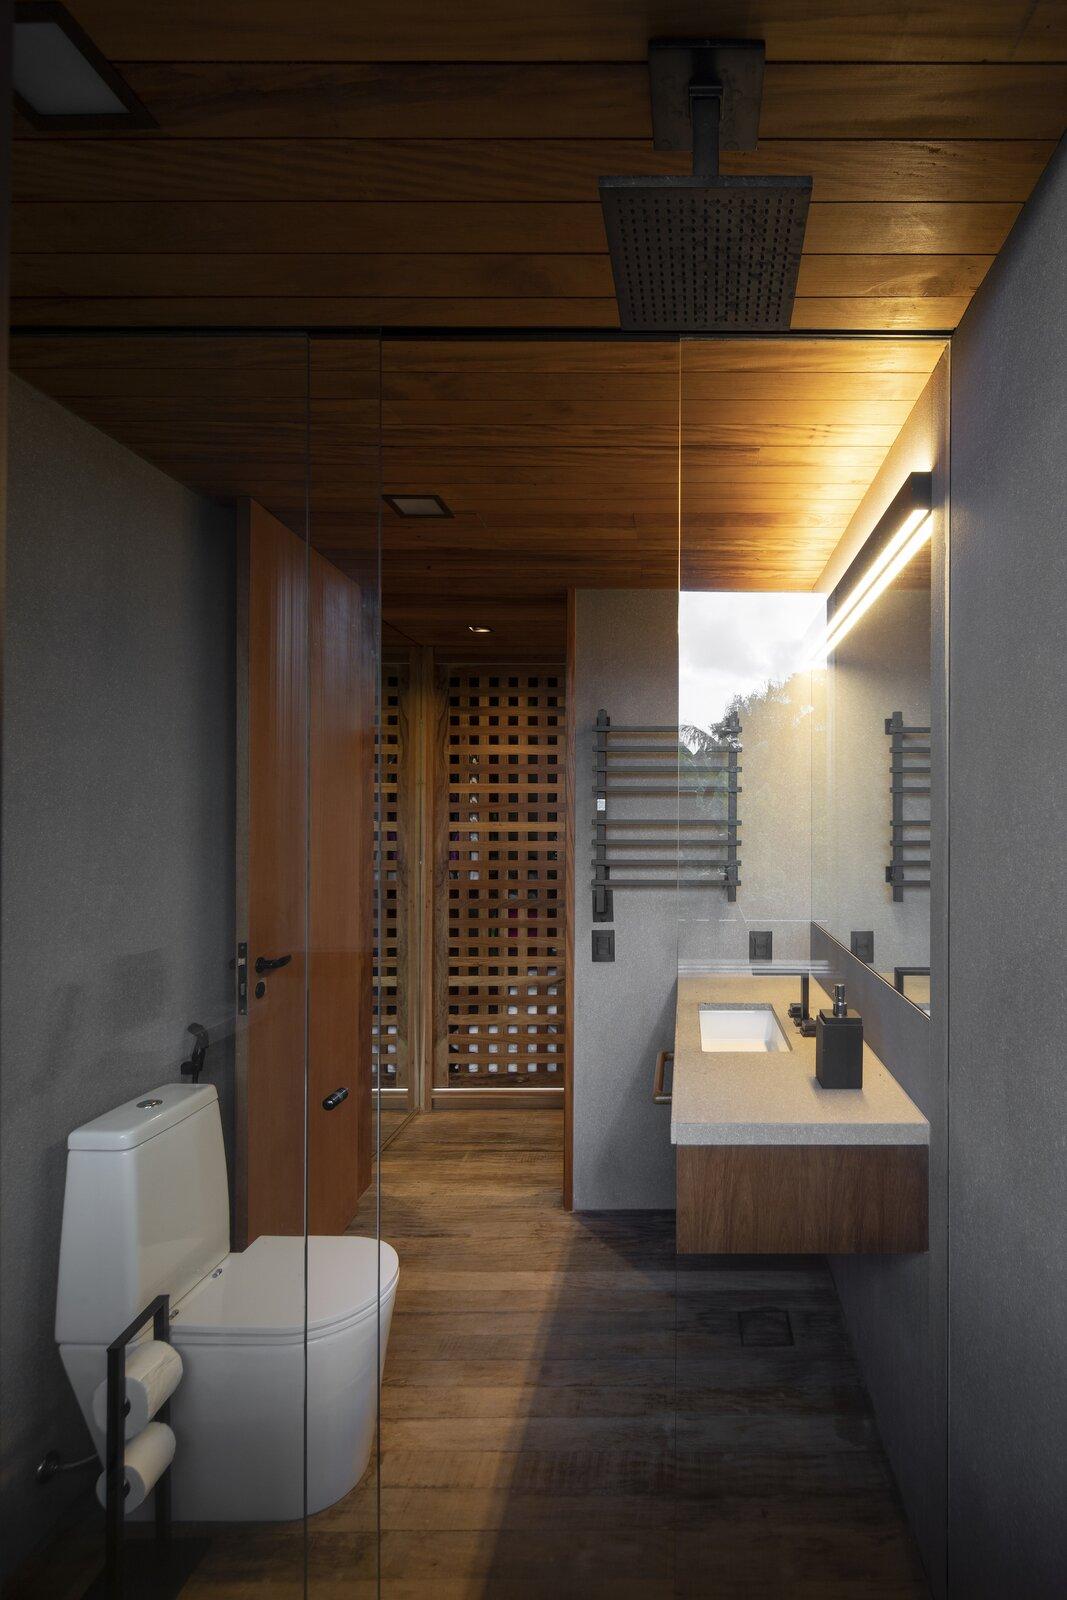 Bathroom of Casa Iporanga by Daniel Fromer.